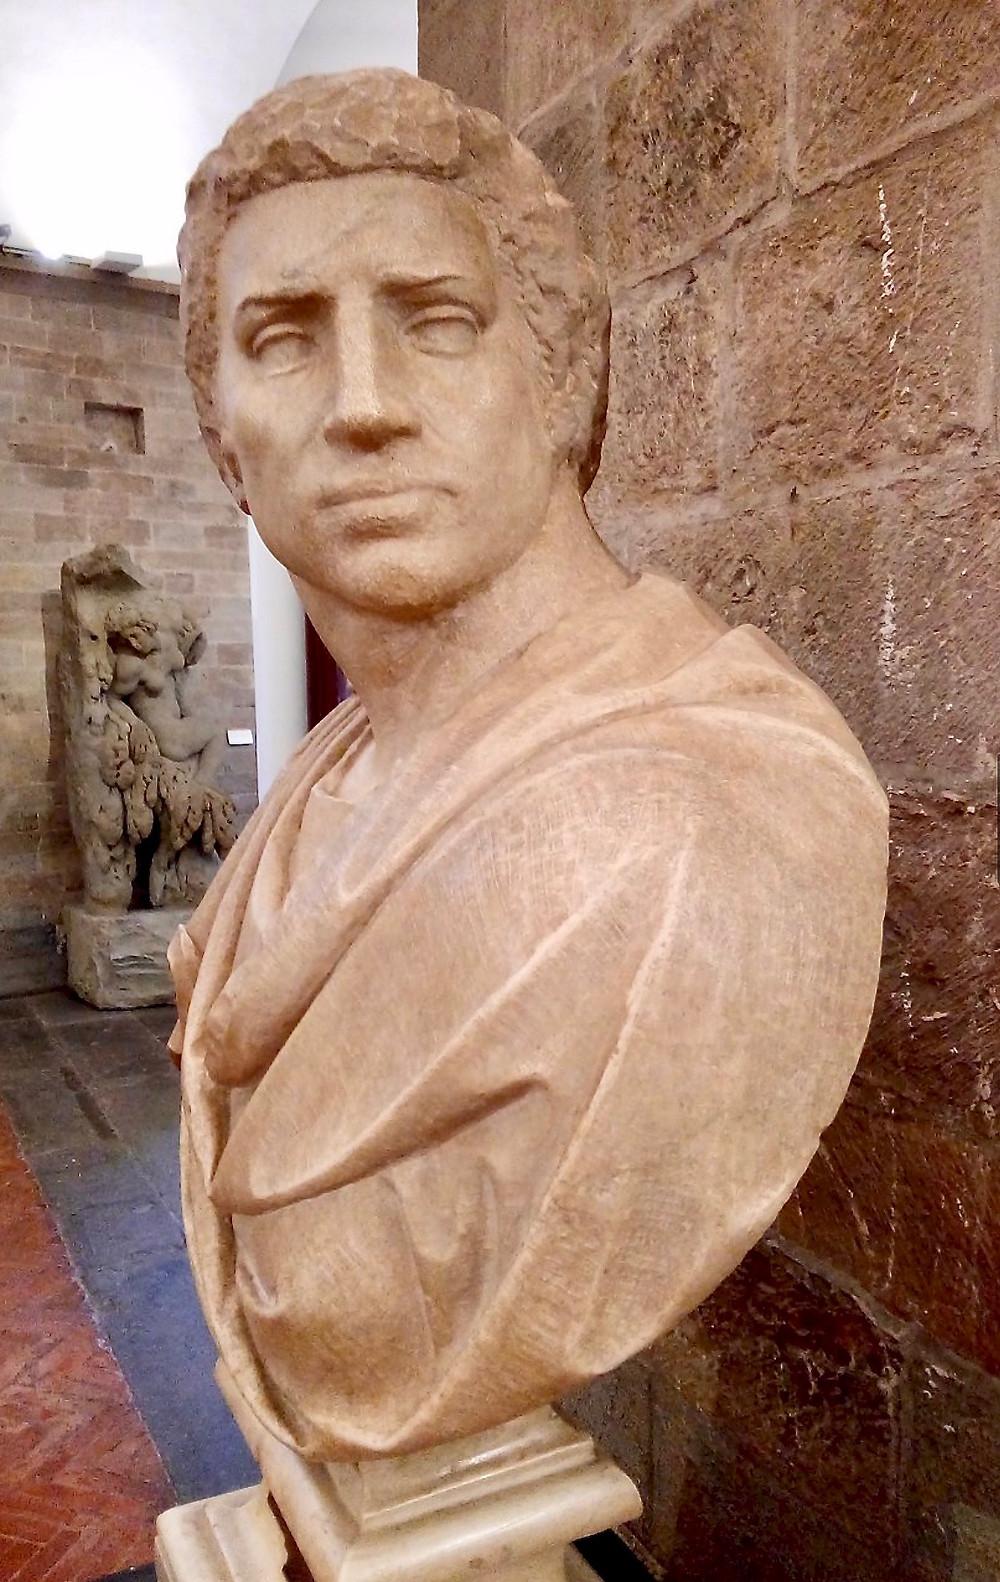 Michelangelo, Bust of Brutus, 1539-40